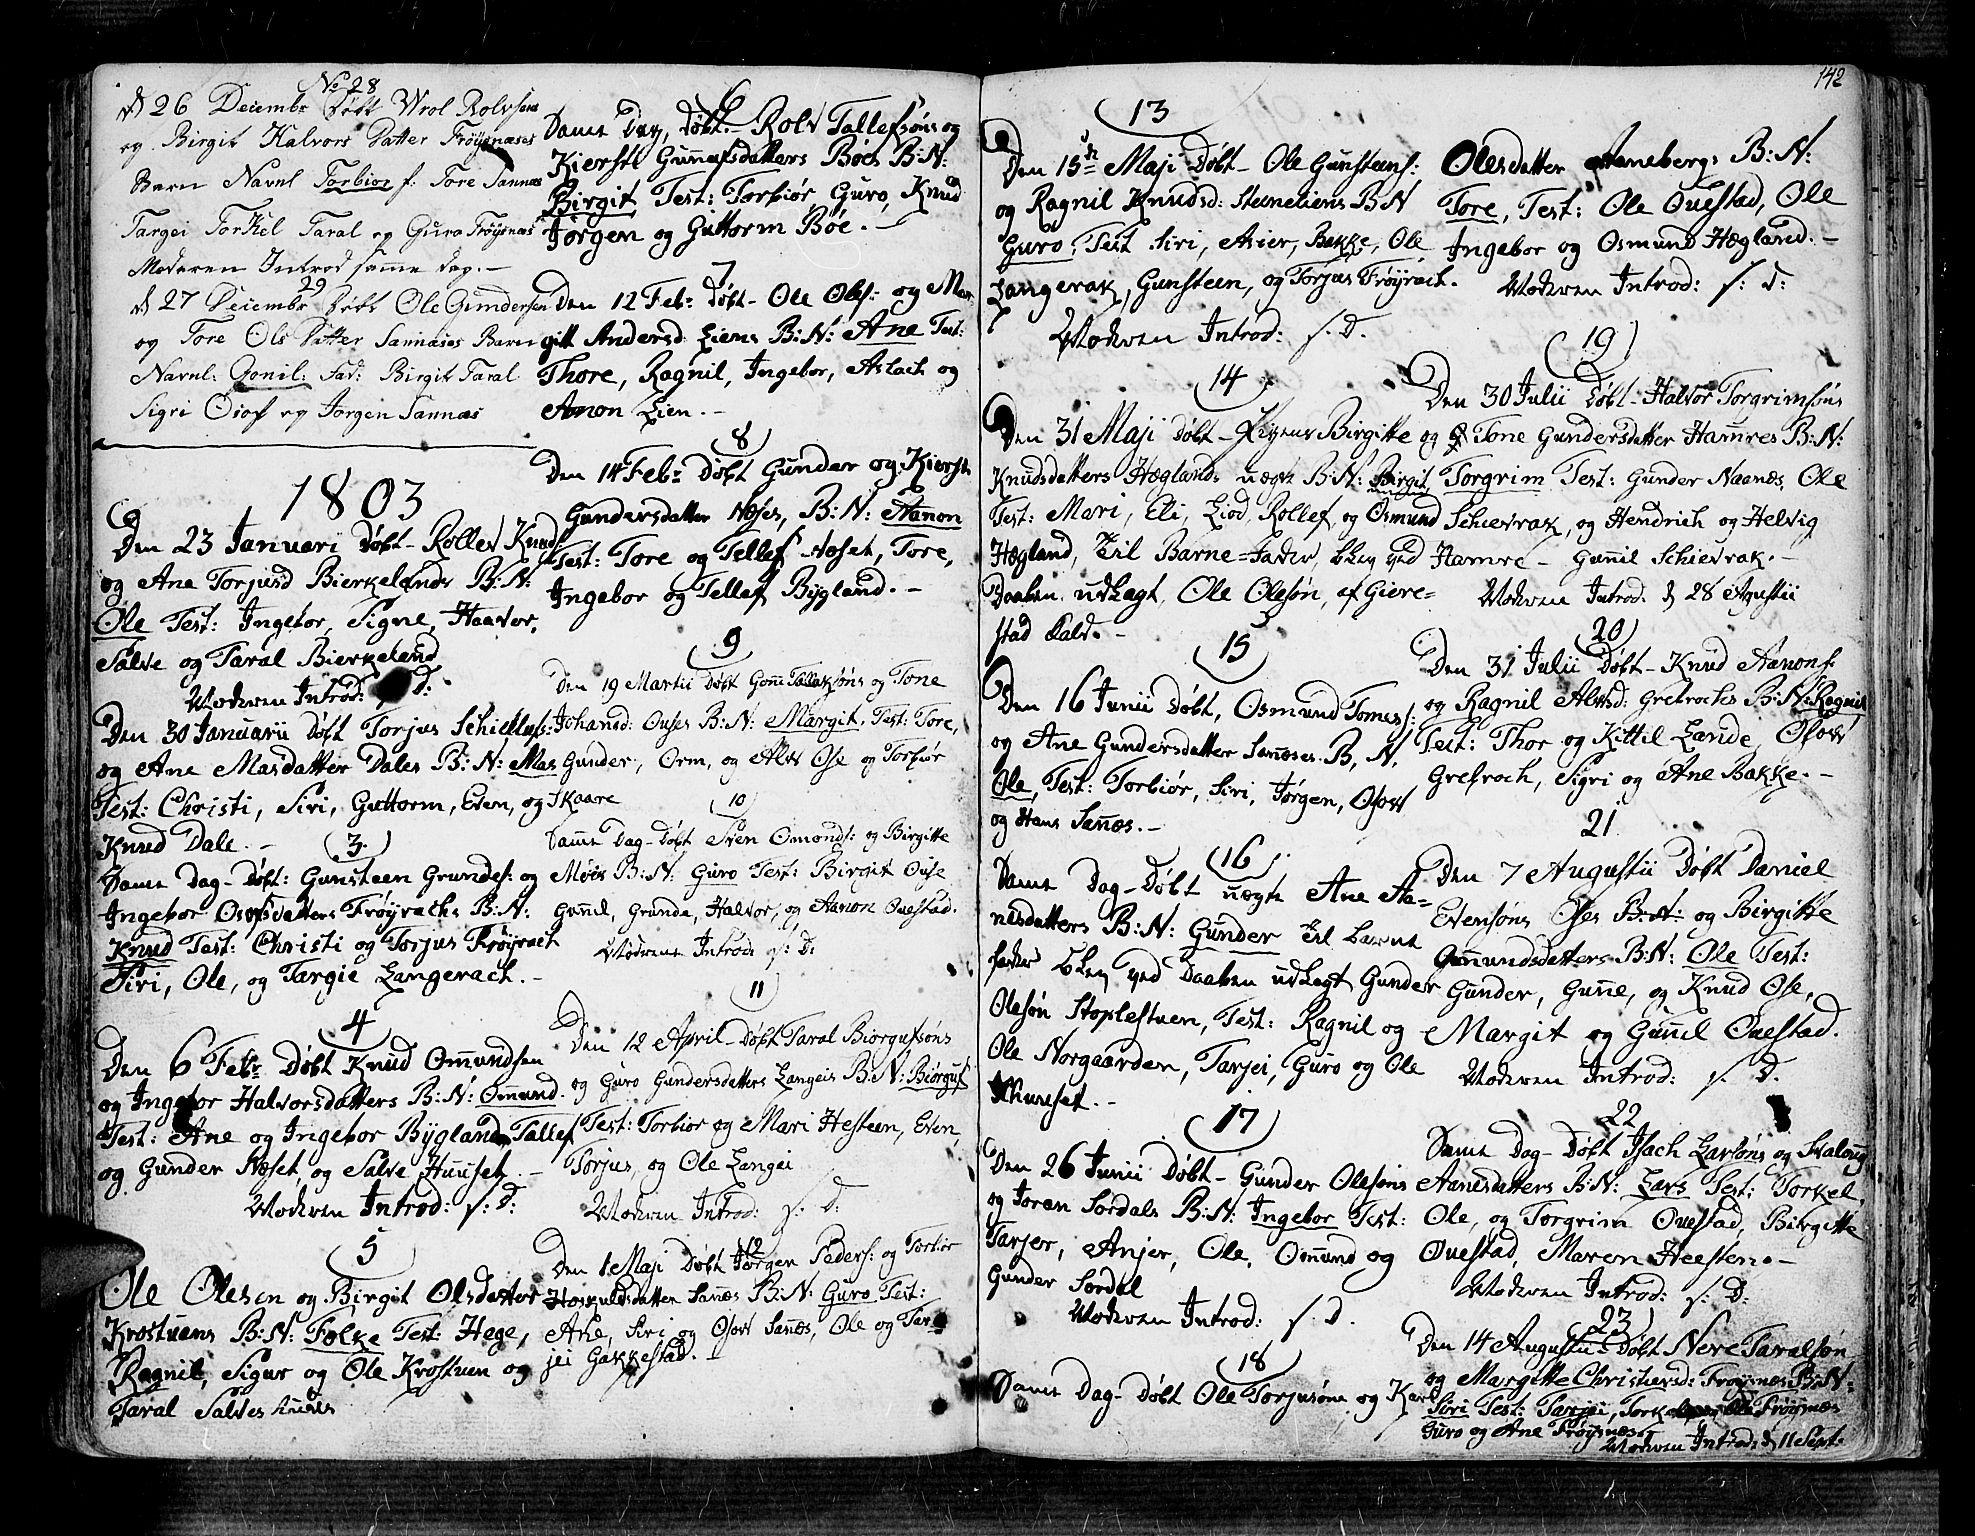 SAK, Bygland sokneprestkontor, F/Fa/Fab/L0002: Ministerialbok nr. A 2, 1766-1816, s. 136